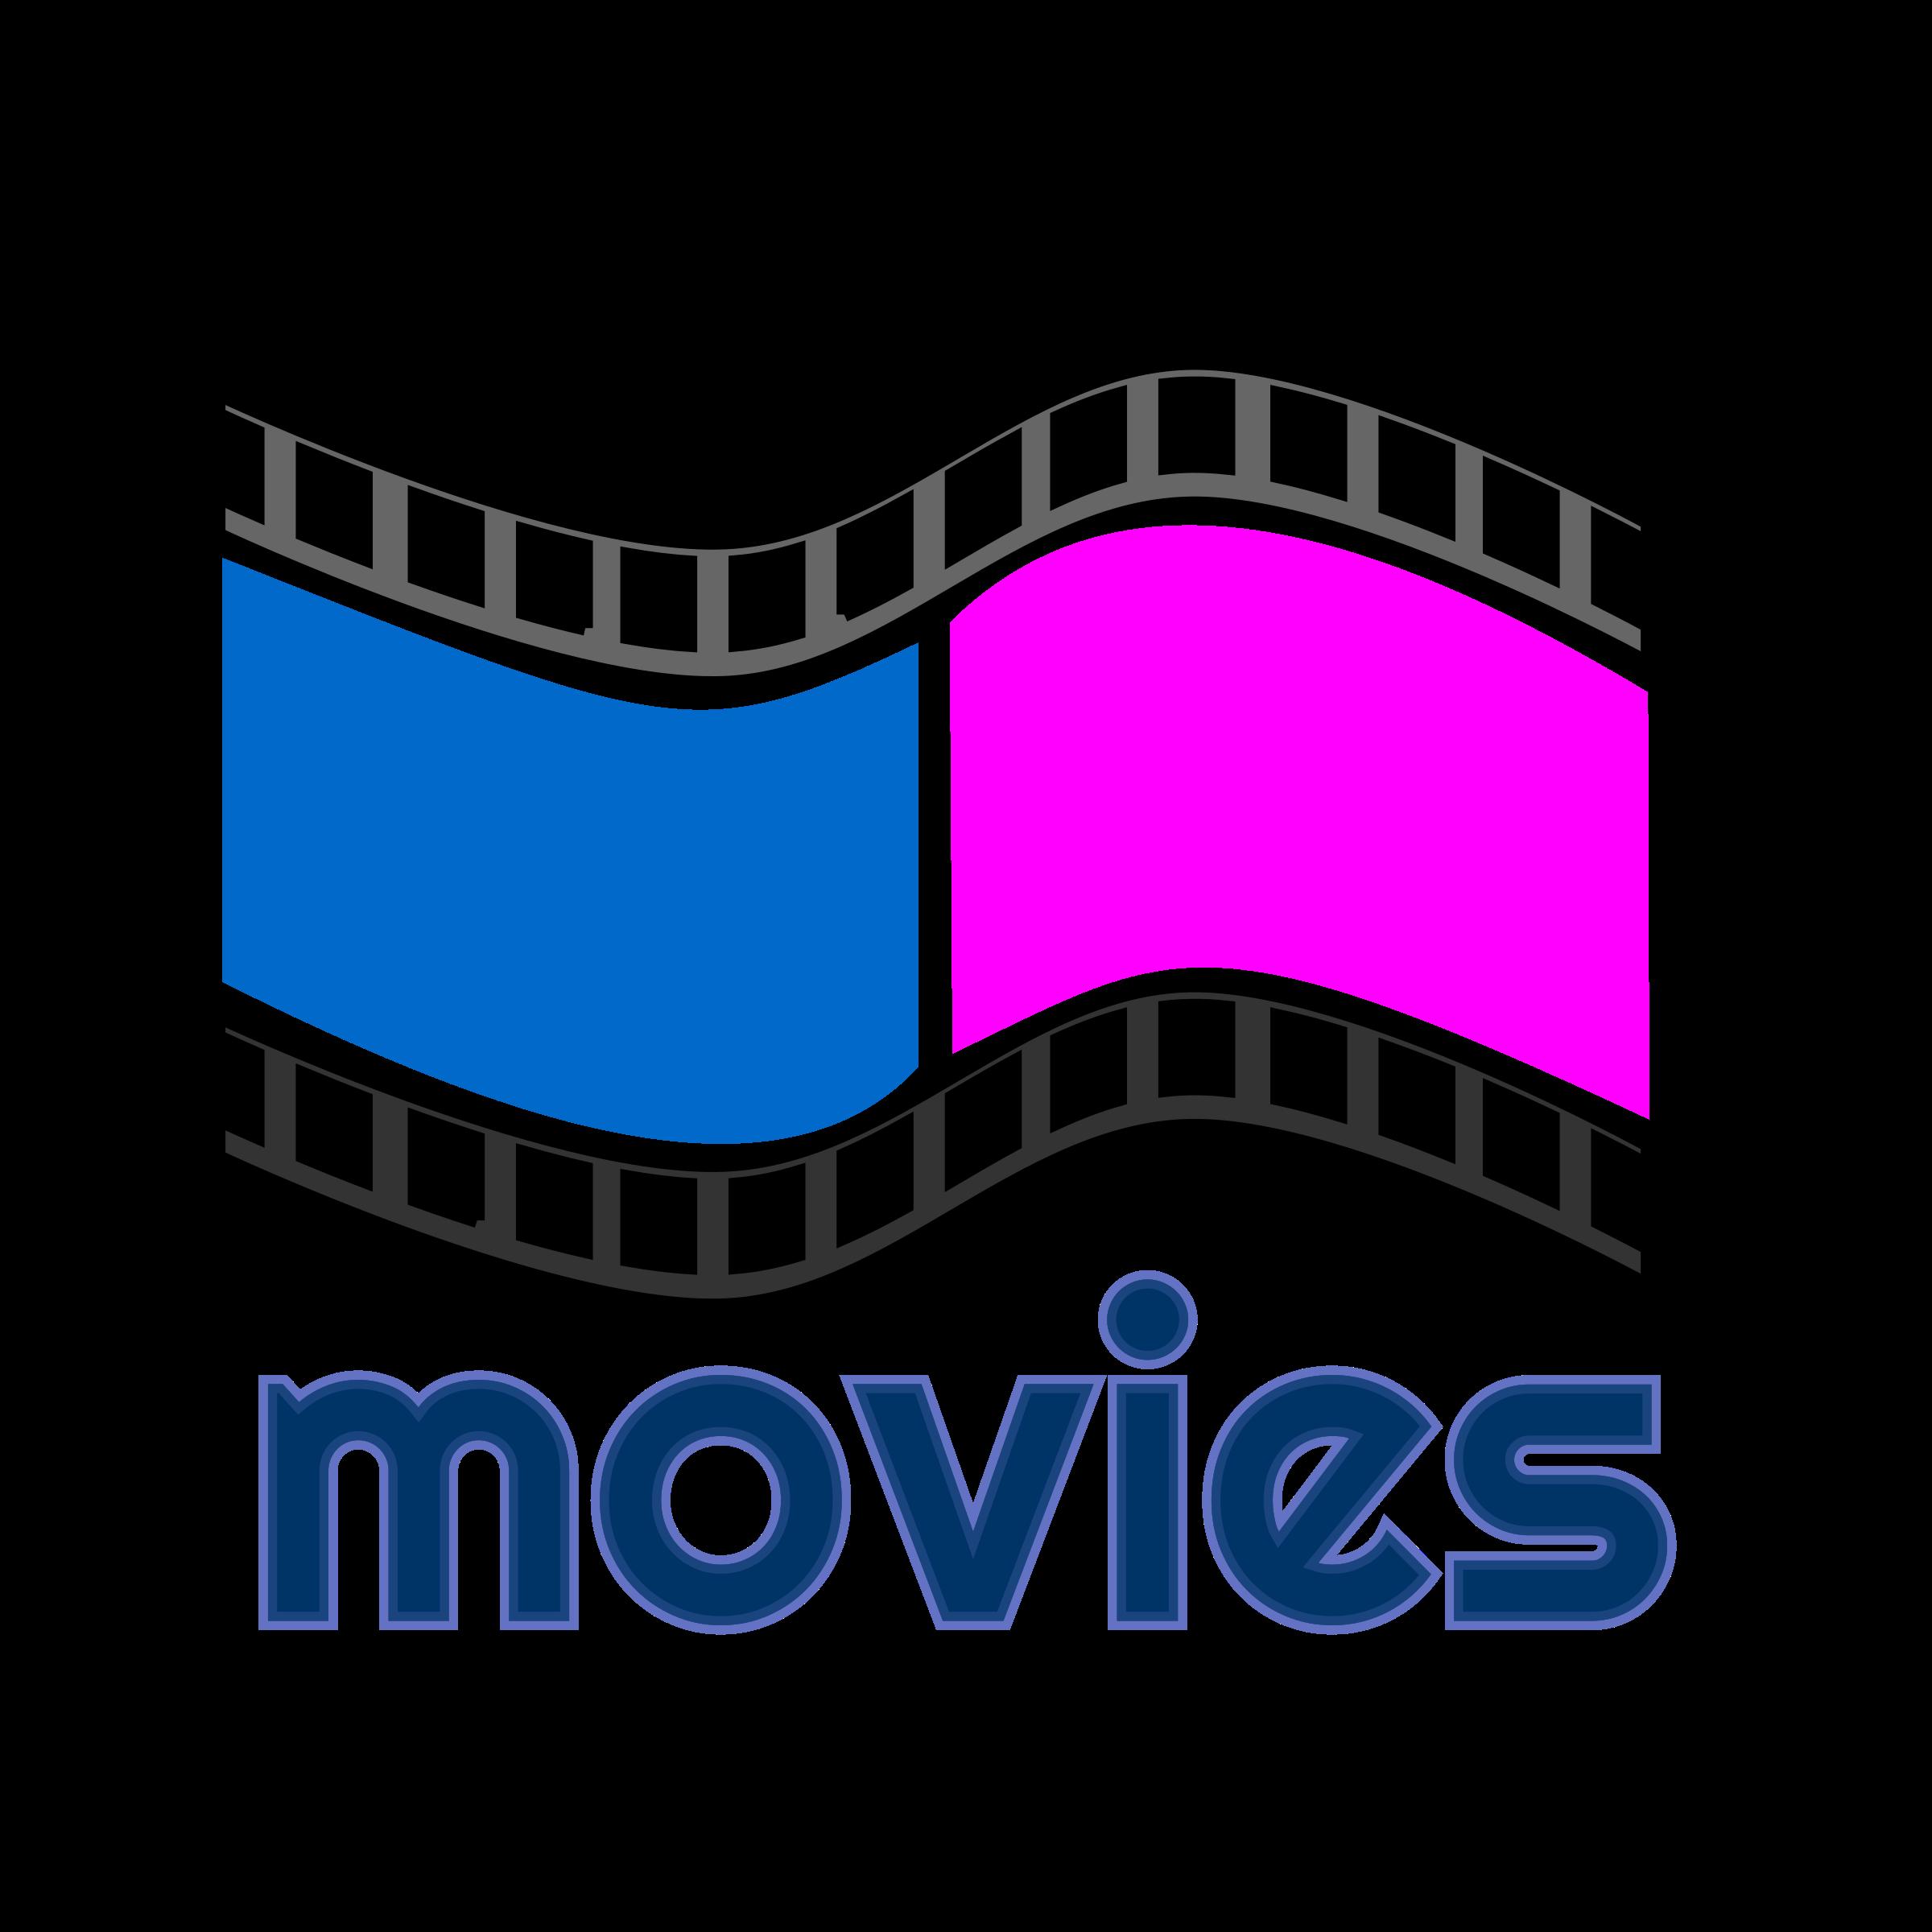 Movies big image png. Film clipart jpeg